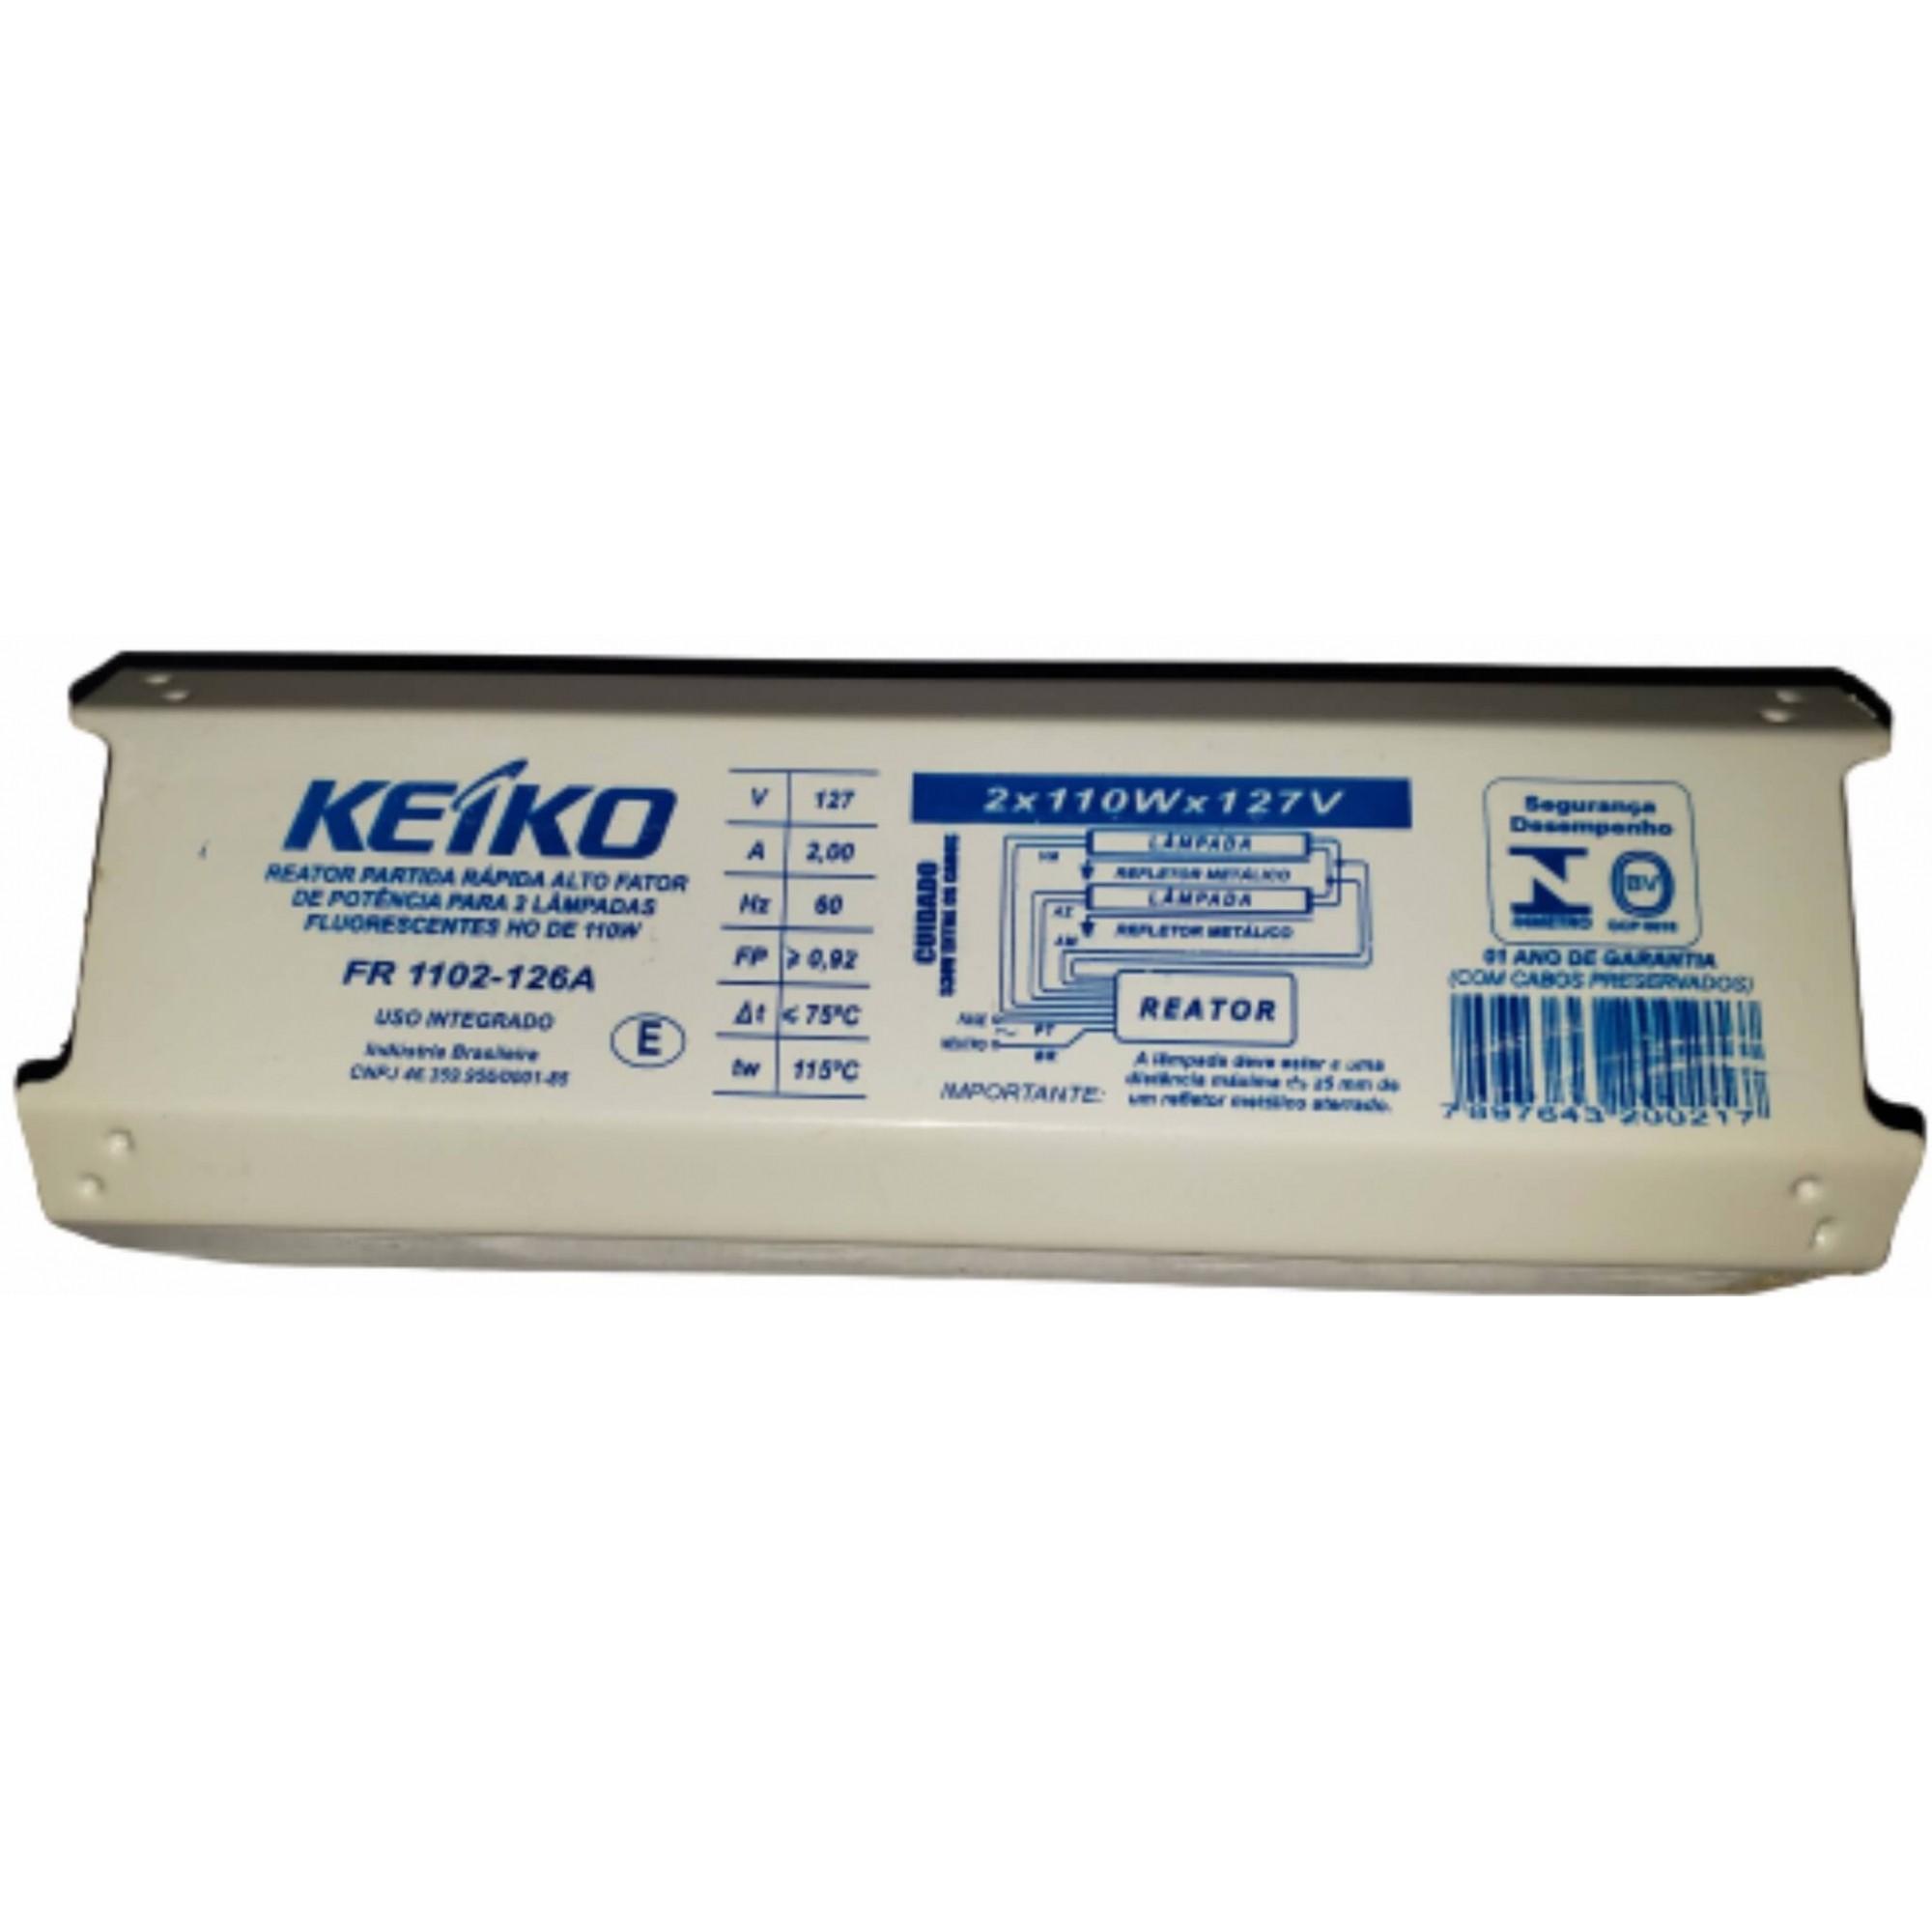 Reator Eletromagnético 2x110x127v - KEIKO